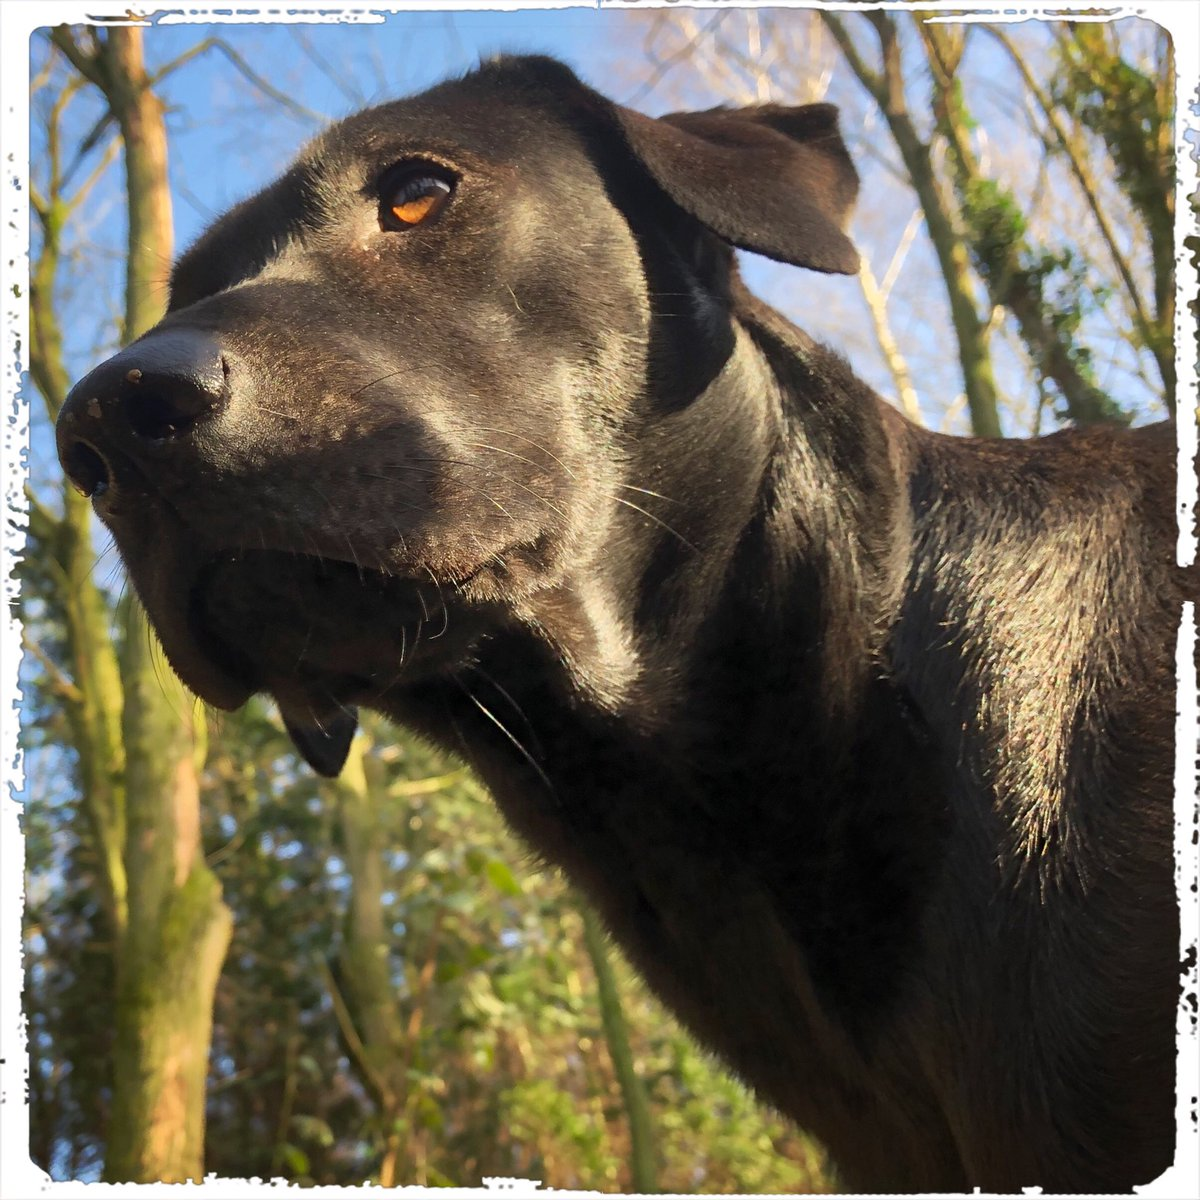 It's Marley on #happyfriday  .  #doglover #ilovemydog #instadog  #meinhund #dogs_of_world #dogsearth #hund #dog #dogislove #trustrespectlove #hundeland #hundeblog #lieblingshund #lebenmithund #fellnase  #besterhund #dogsneeddogs #doggy #dogs #hundefreundschaft #besterhundpic.twitter.com/RtKiCYPeXM